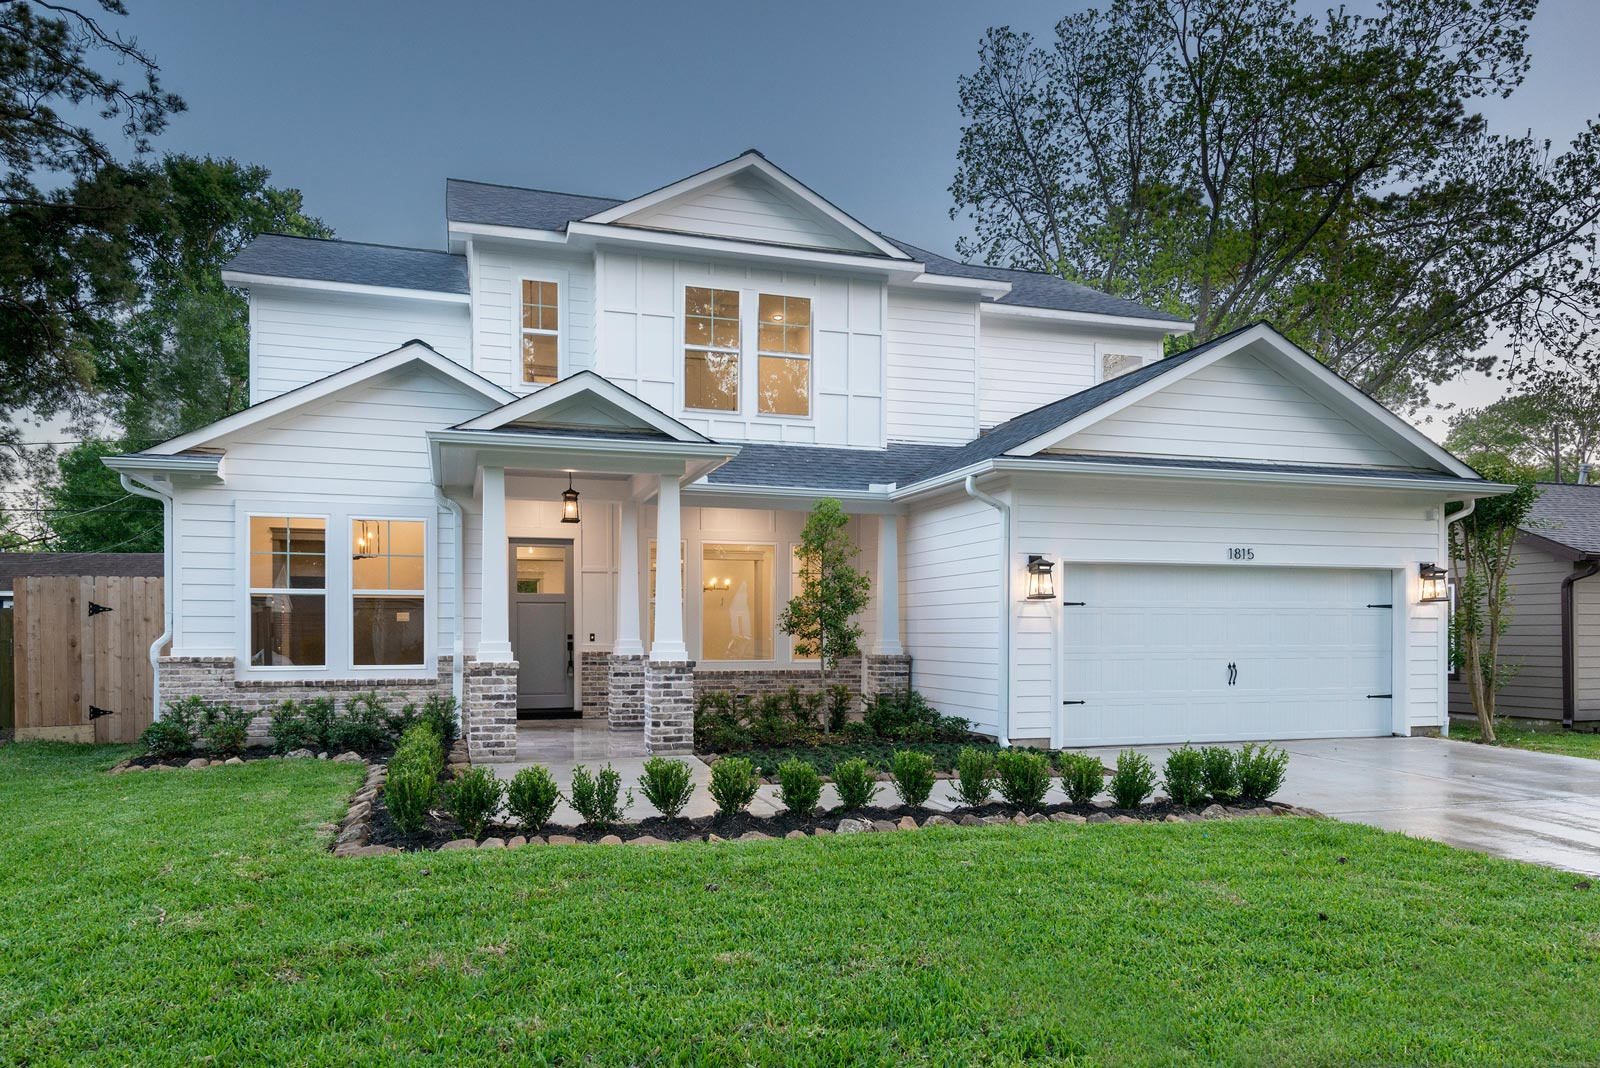 Houston-Homebuilder-CustomHomebuilder-Central-Houston-Homebuilder-Oak-Forest-Homebuilder-White-Farmhouse-Exterior-Antique-Chicago-Brick (1)